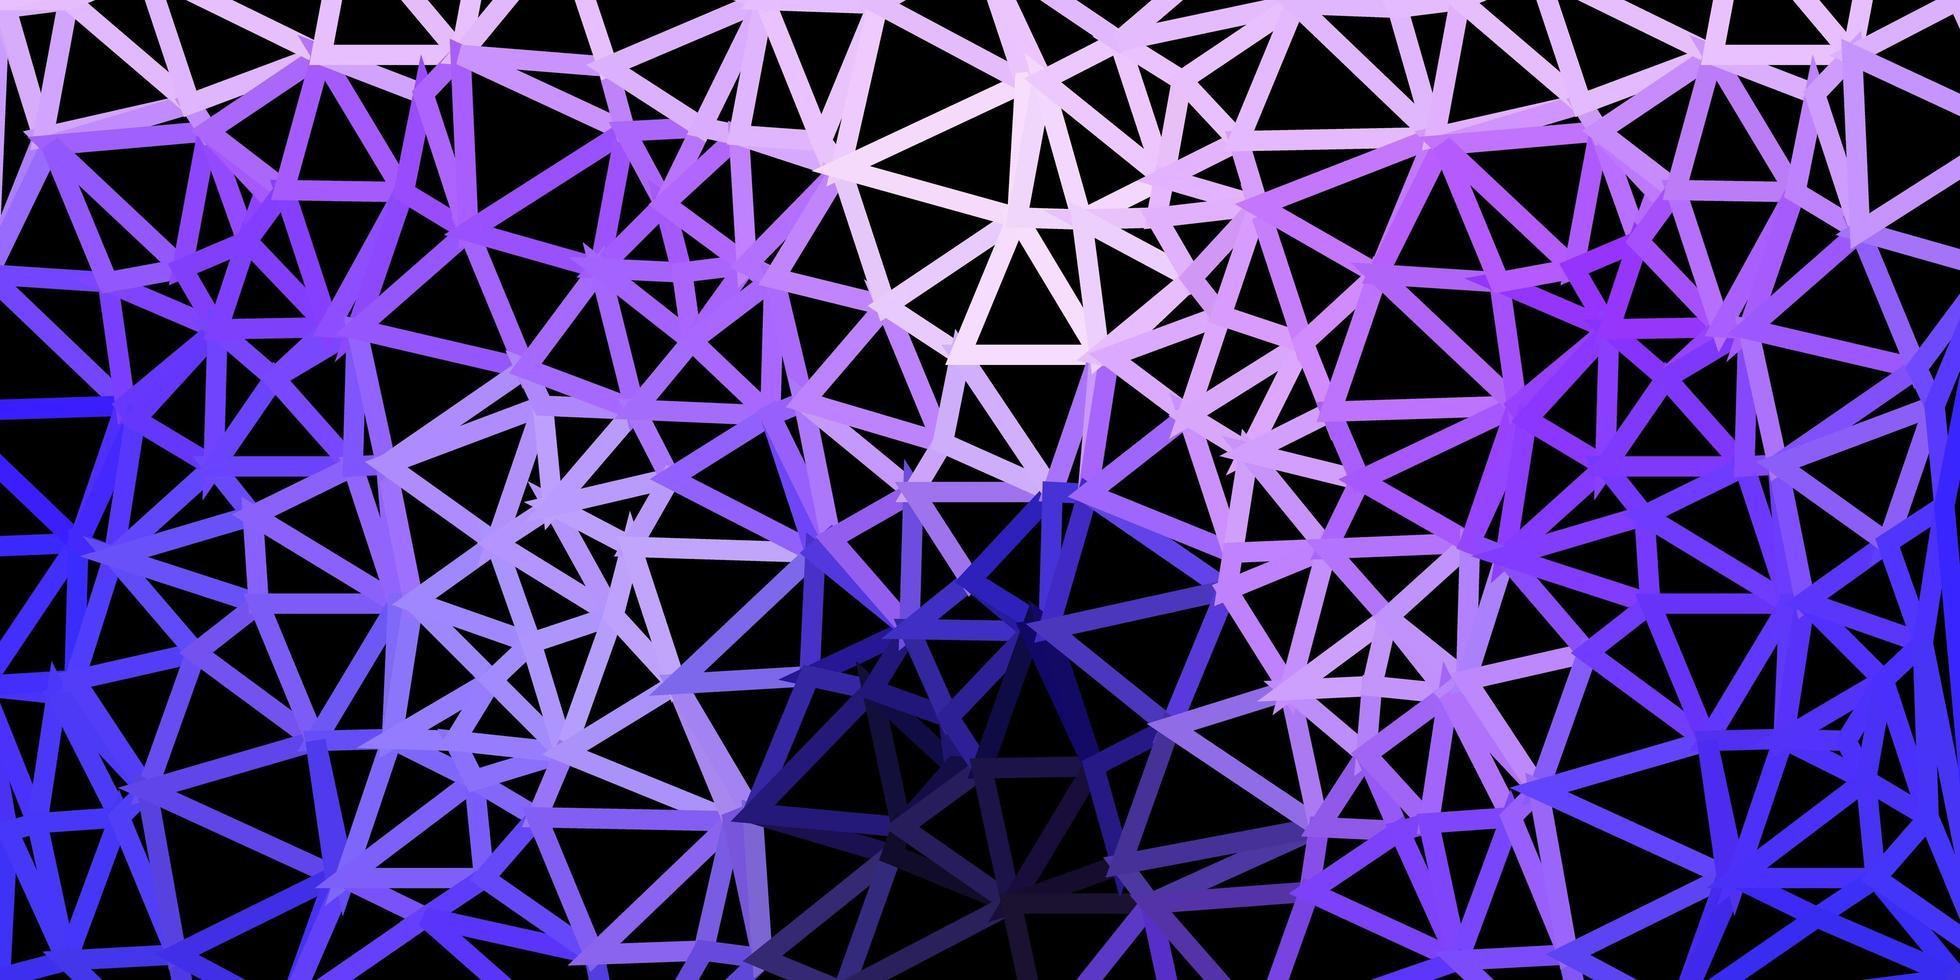 hellvioletter Vektor polygonaler Hintergrund.